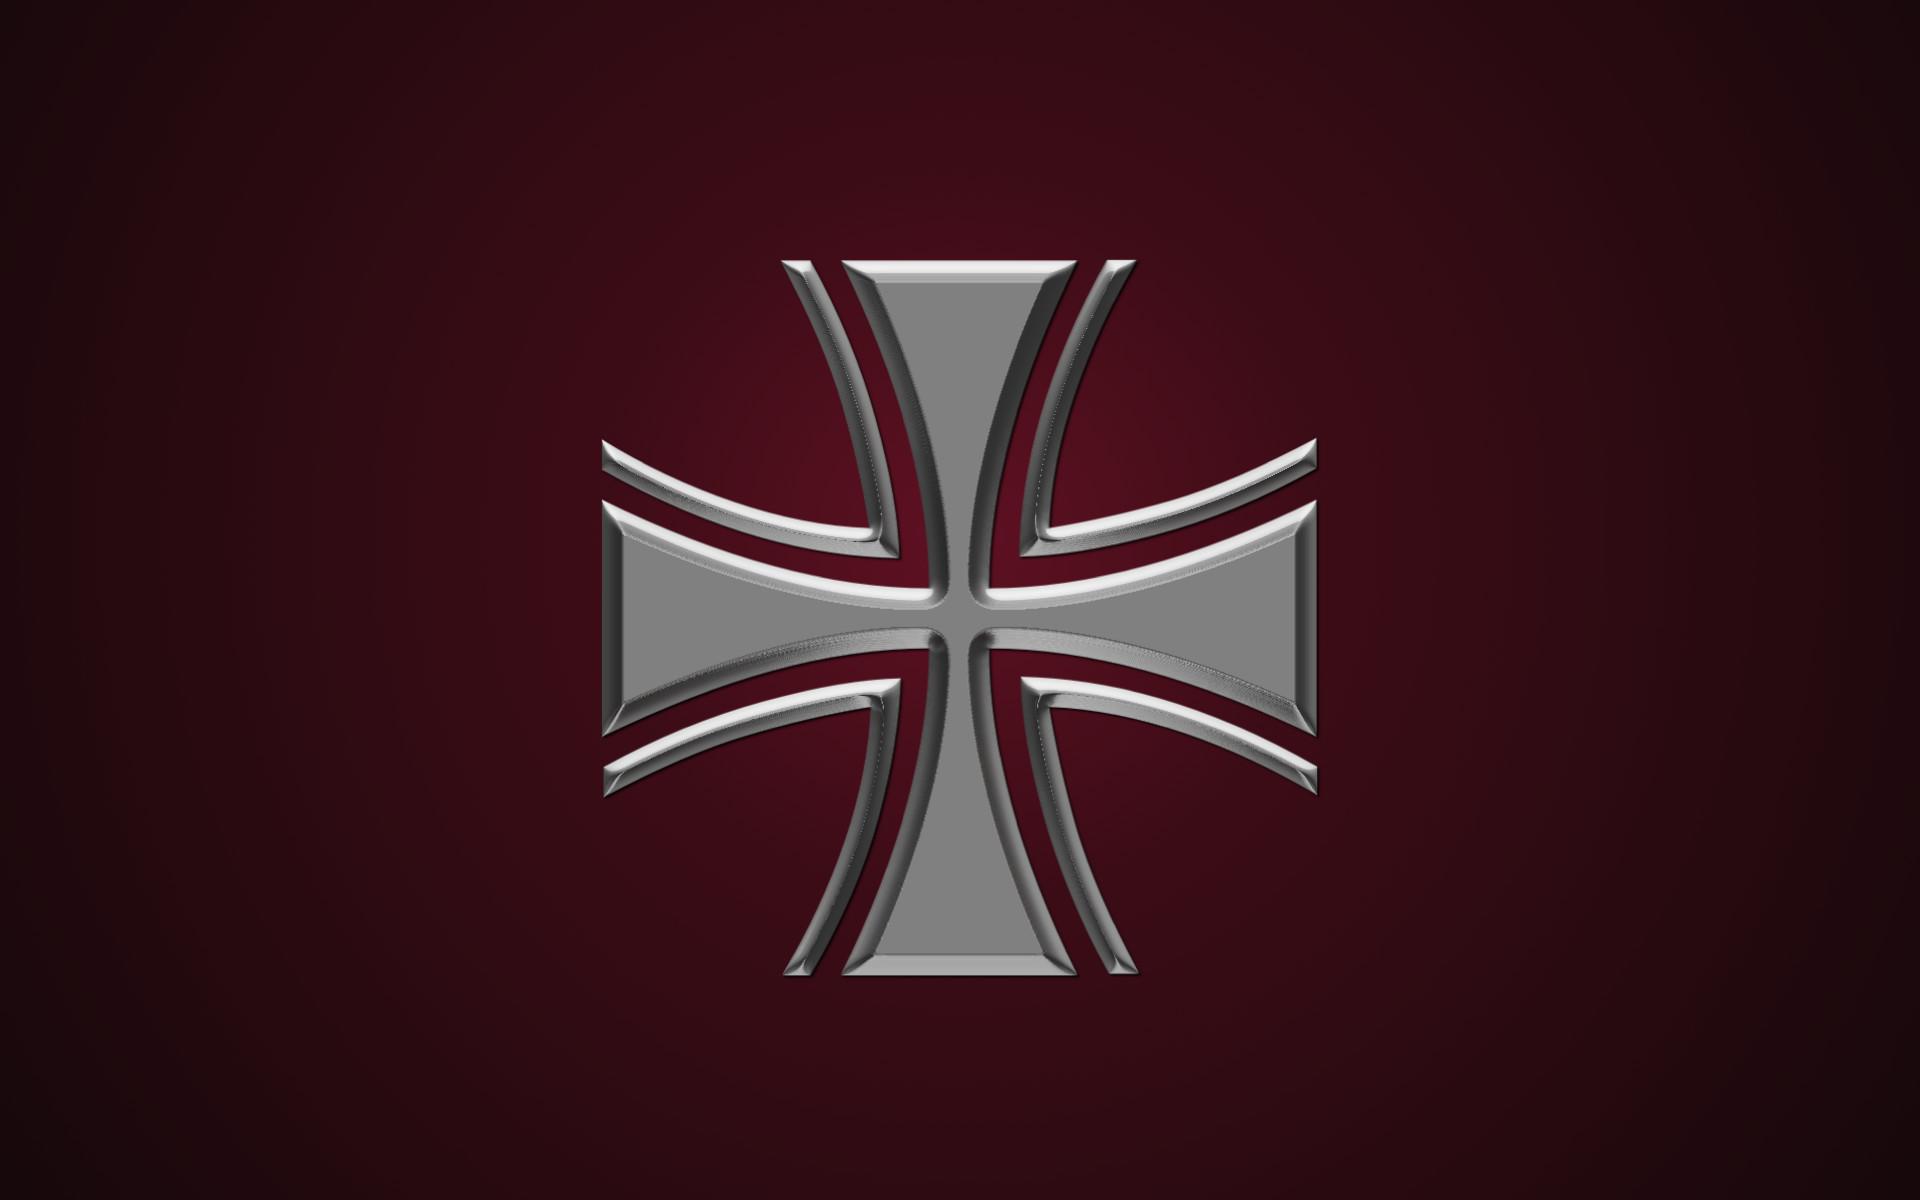 Iron Cross Wallpaper Iron, Cross